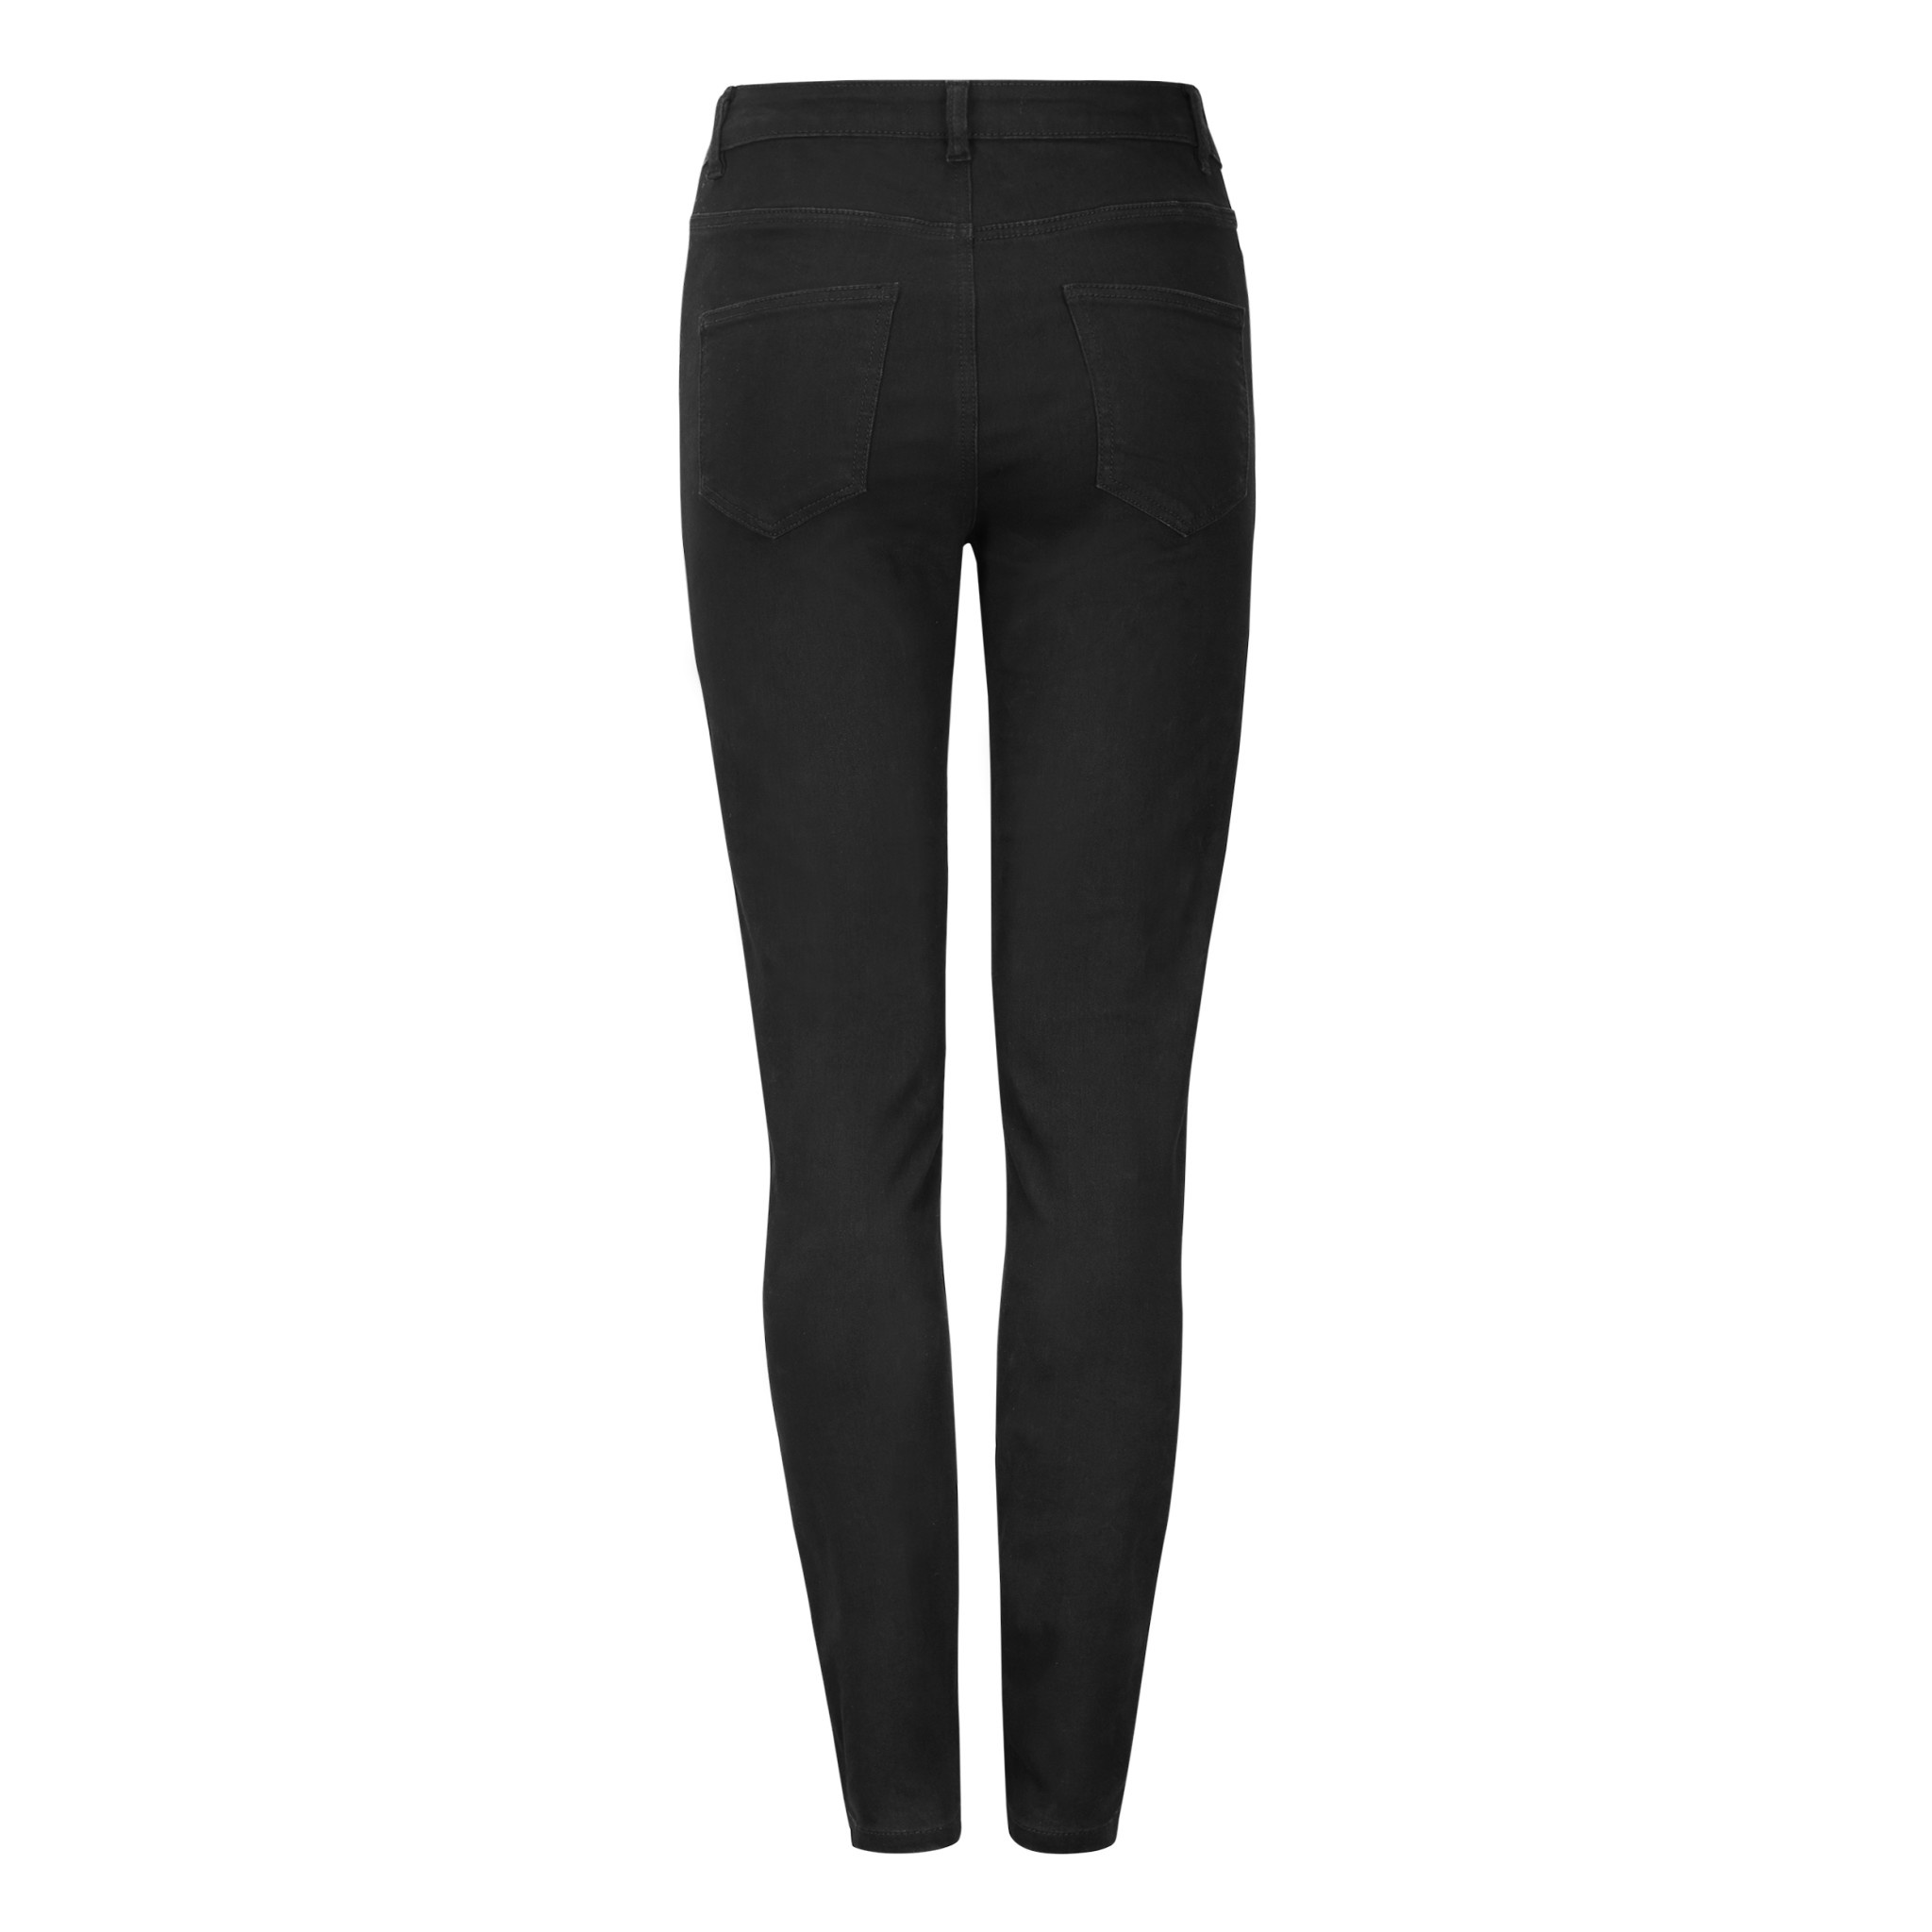 Soft Rebels Highwaist Slim Jeans Black